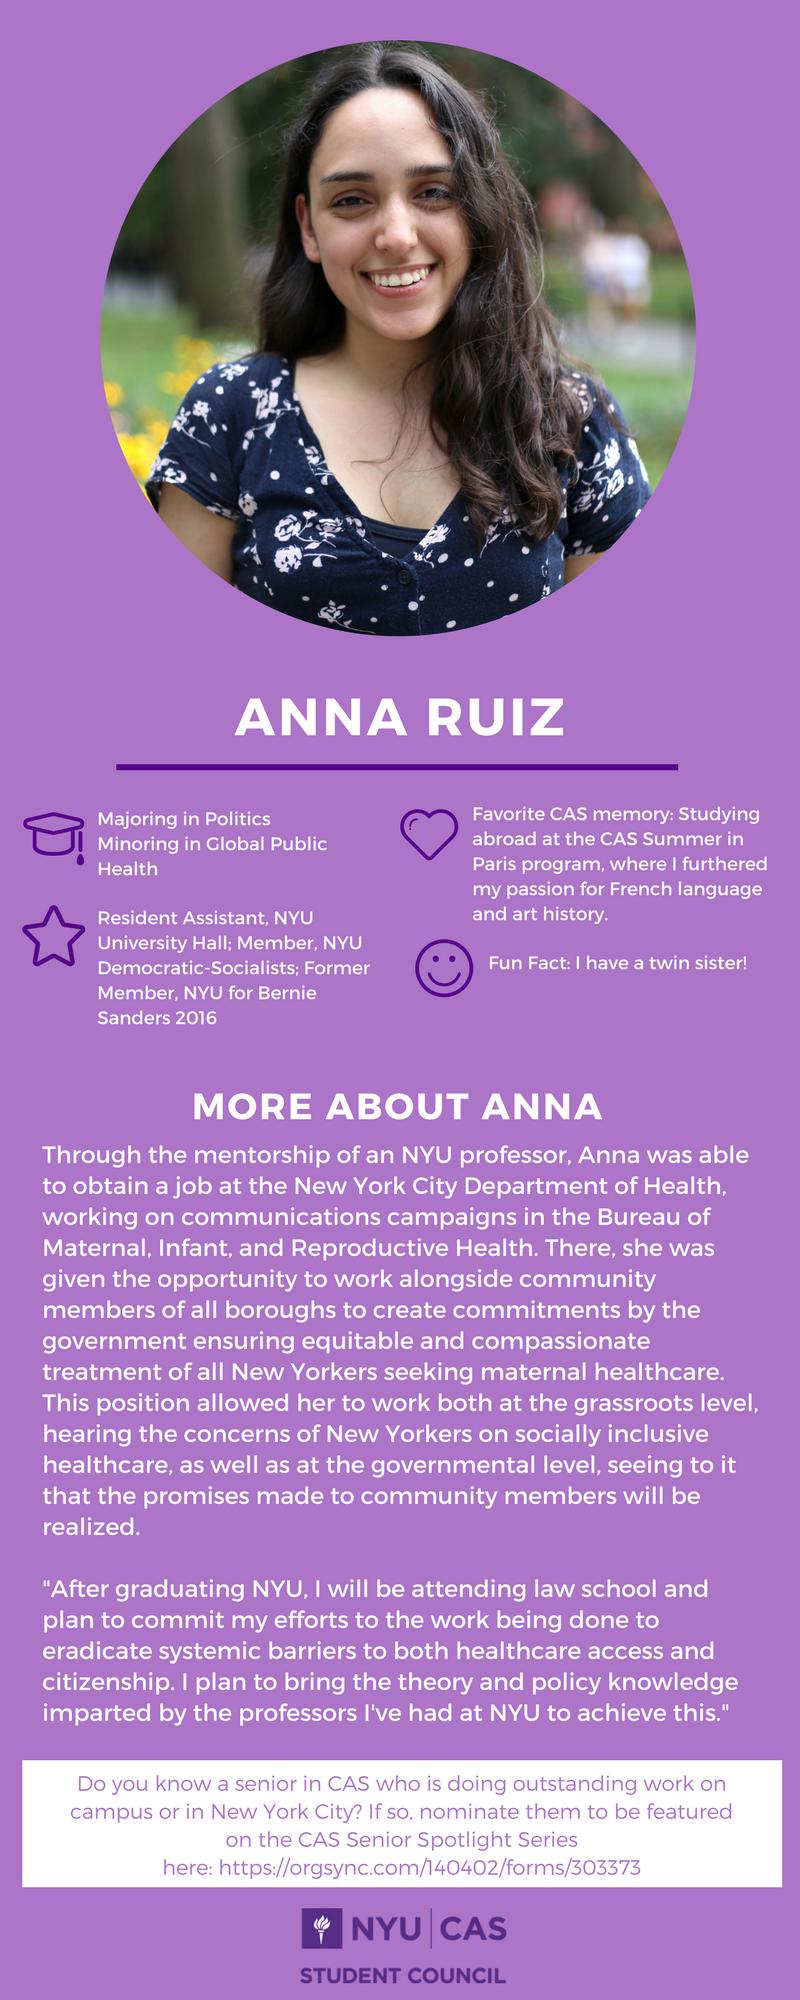 Anna Ruiz